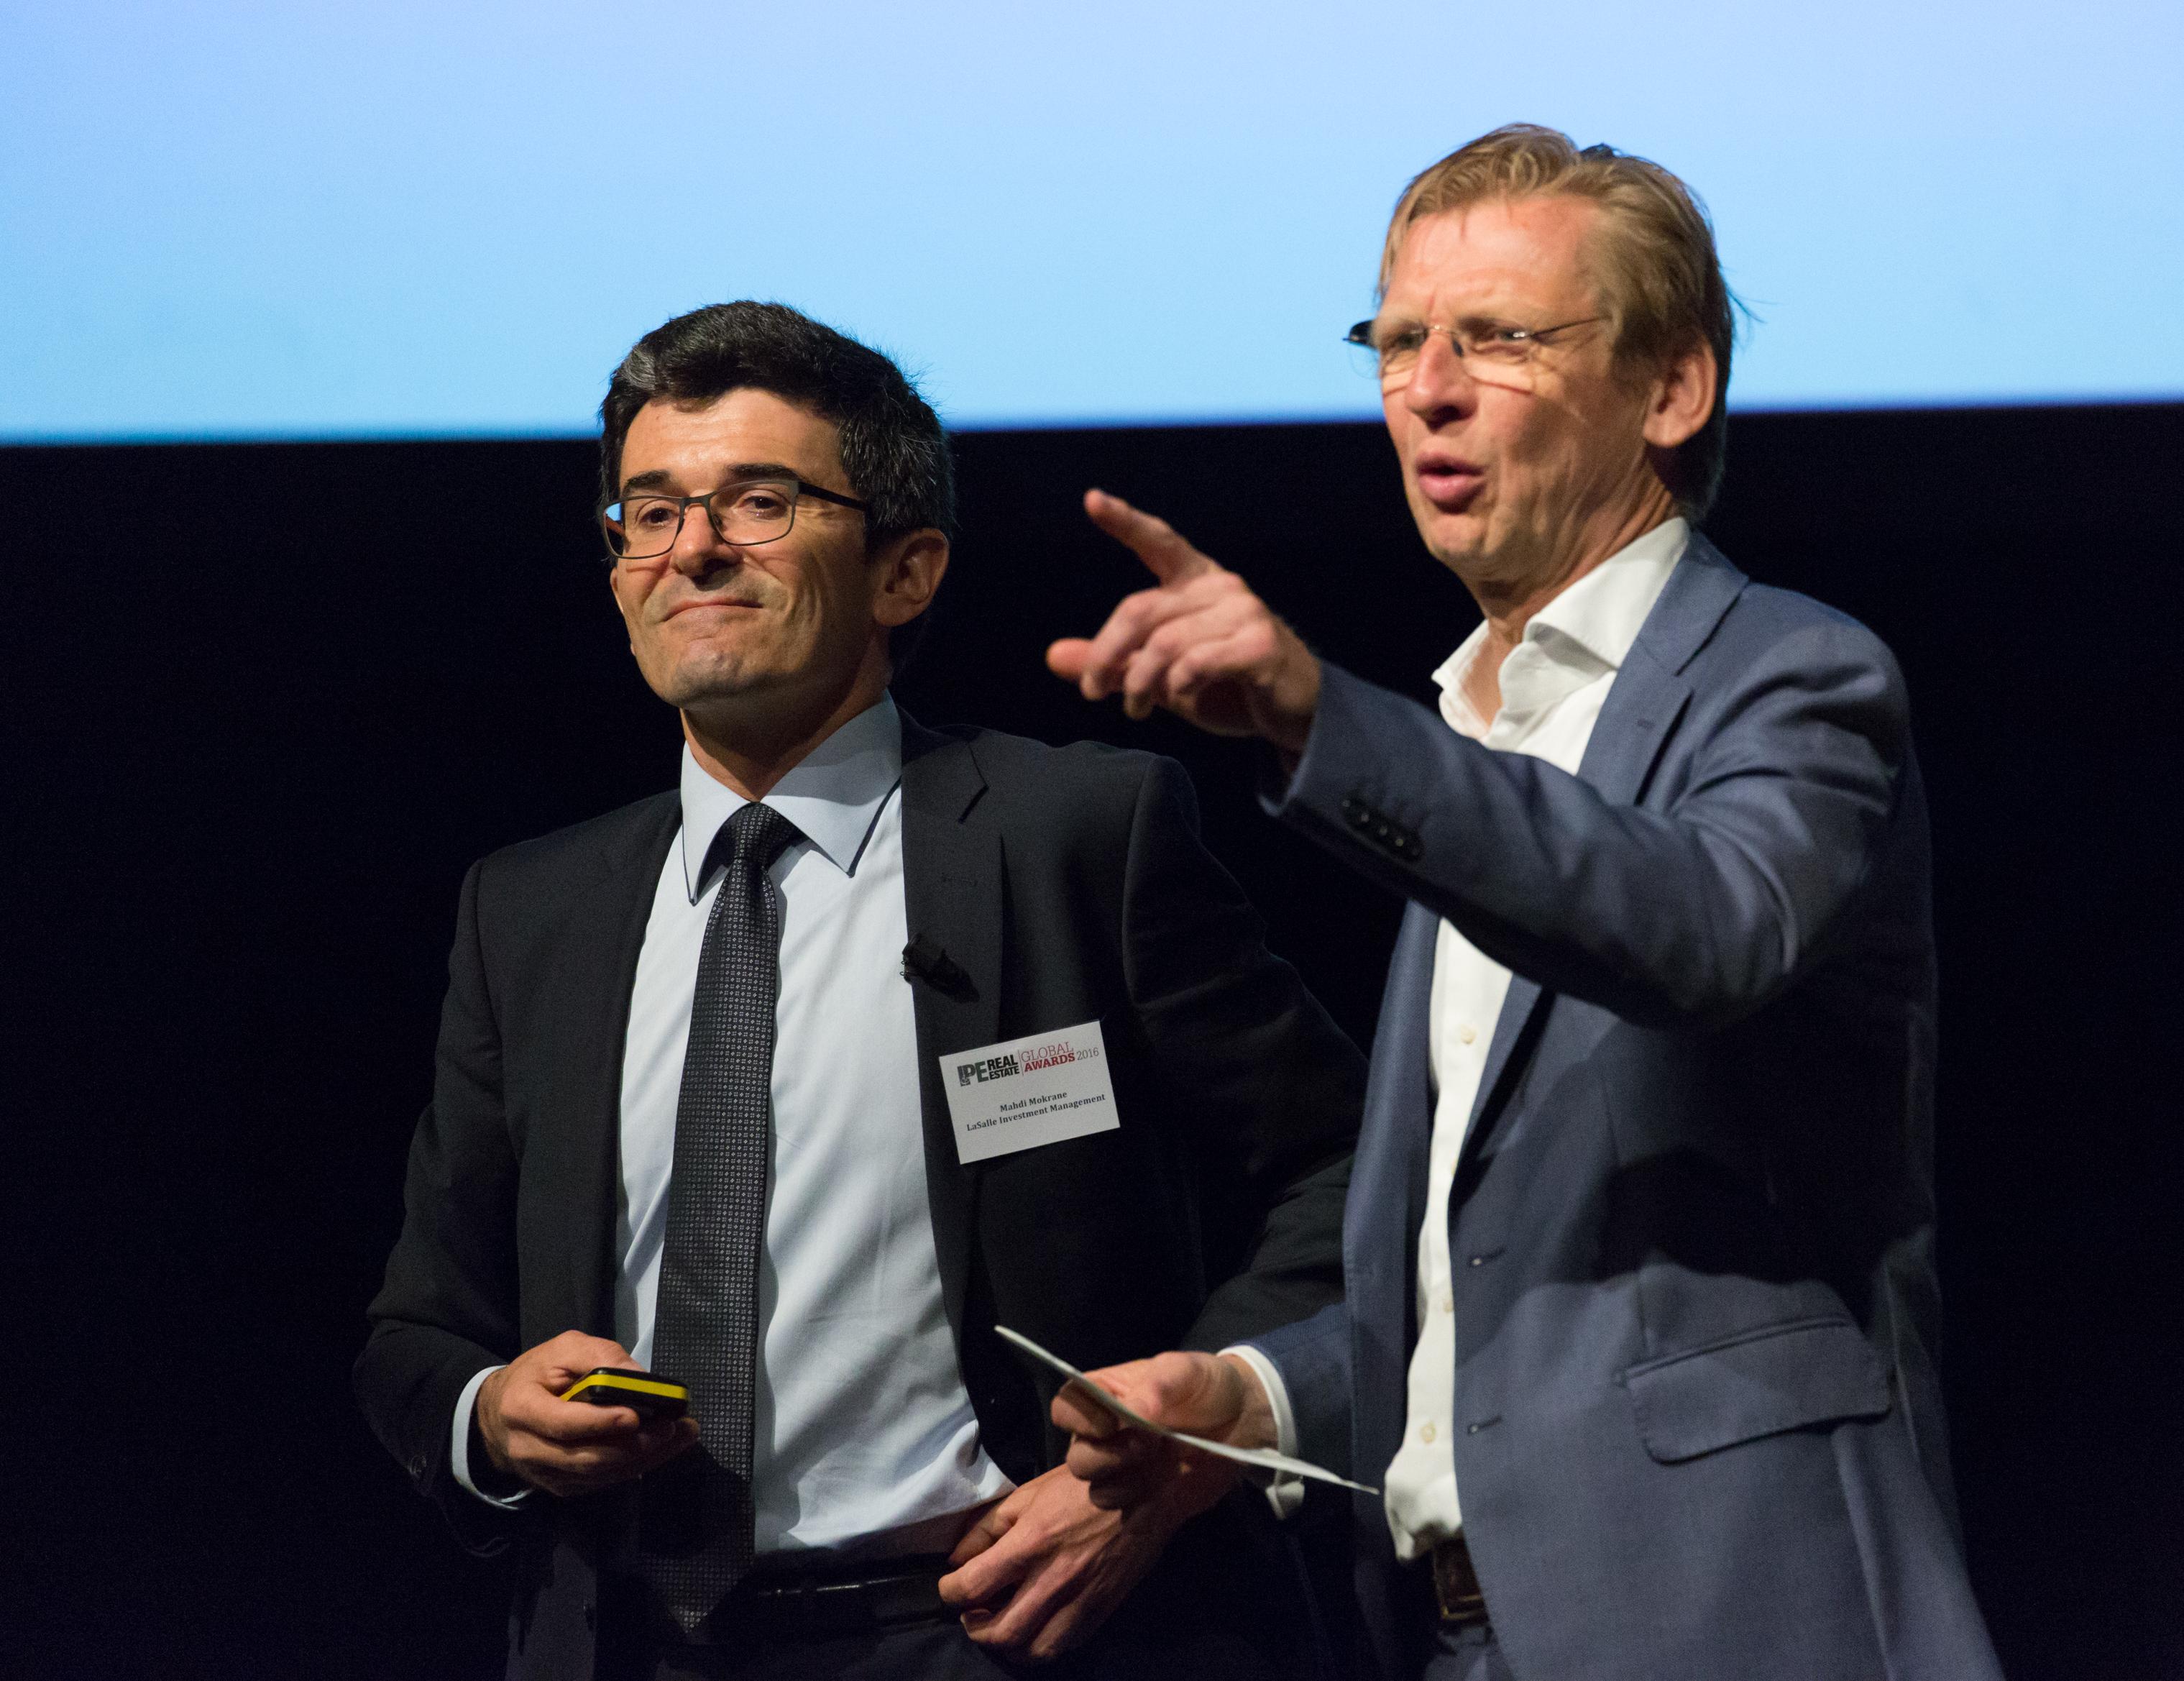 IPE RE Global 2016 - Mahdi Mokrane, Piet Eichholtz